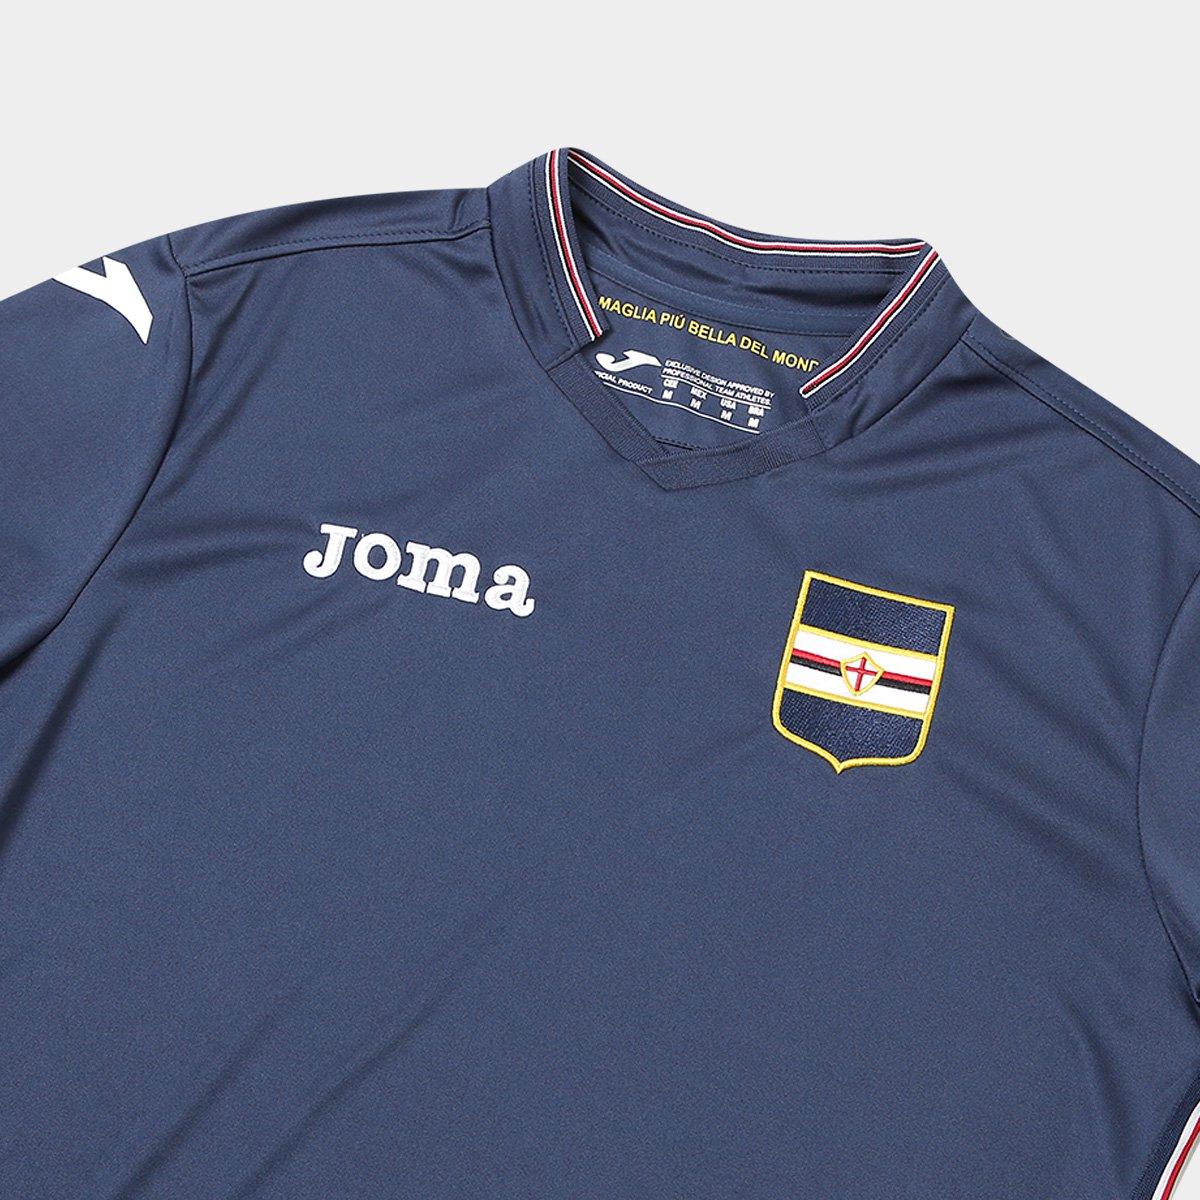 ff54be49c4 Camisa Sampdoria Third 17 18 s n°- Torcedor Joma Masculina - Compre ...